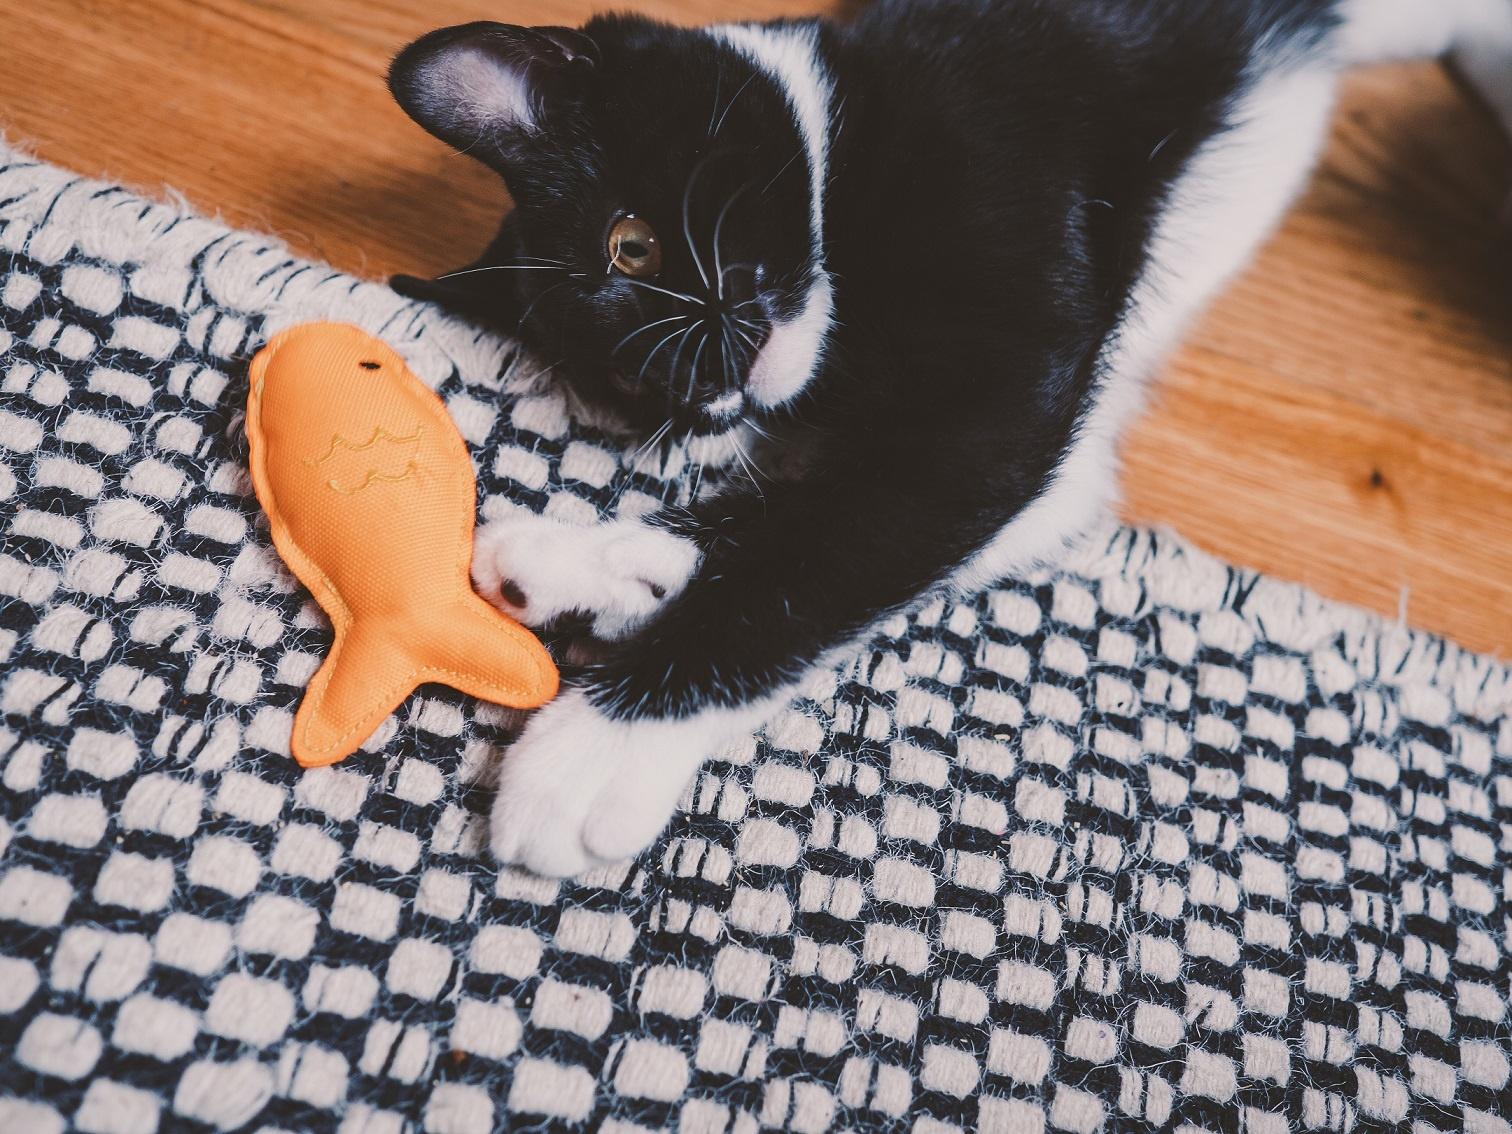 Beco kattenspeeltje met kattenkruid